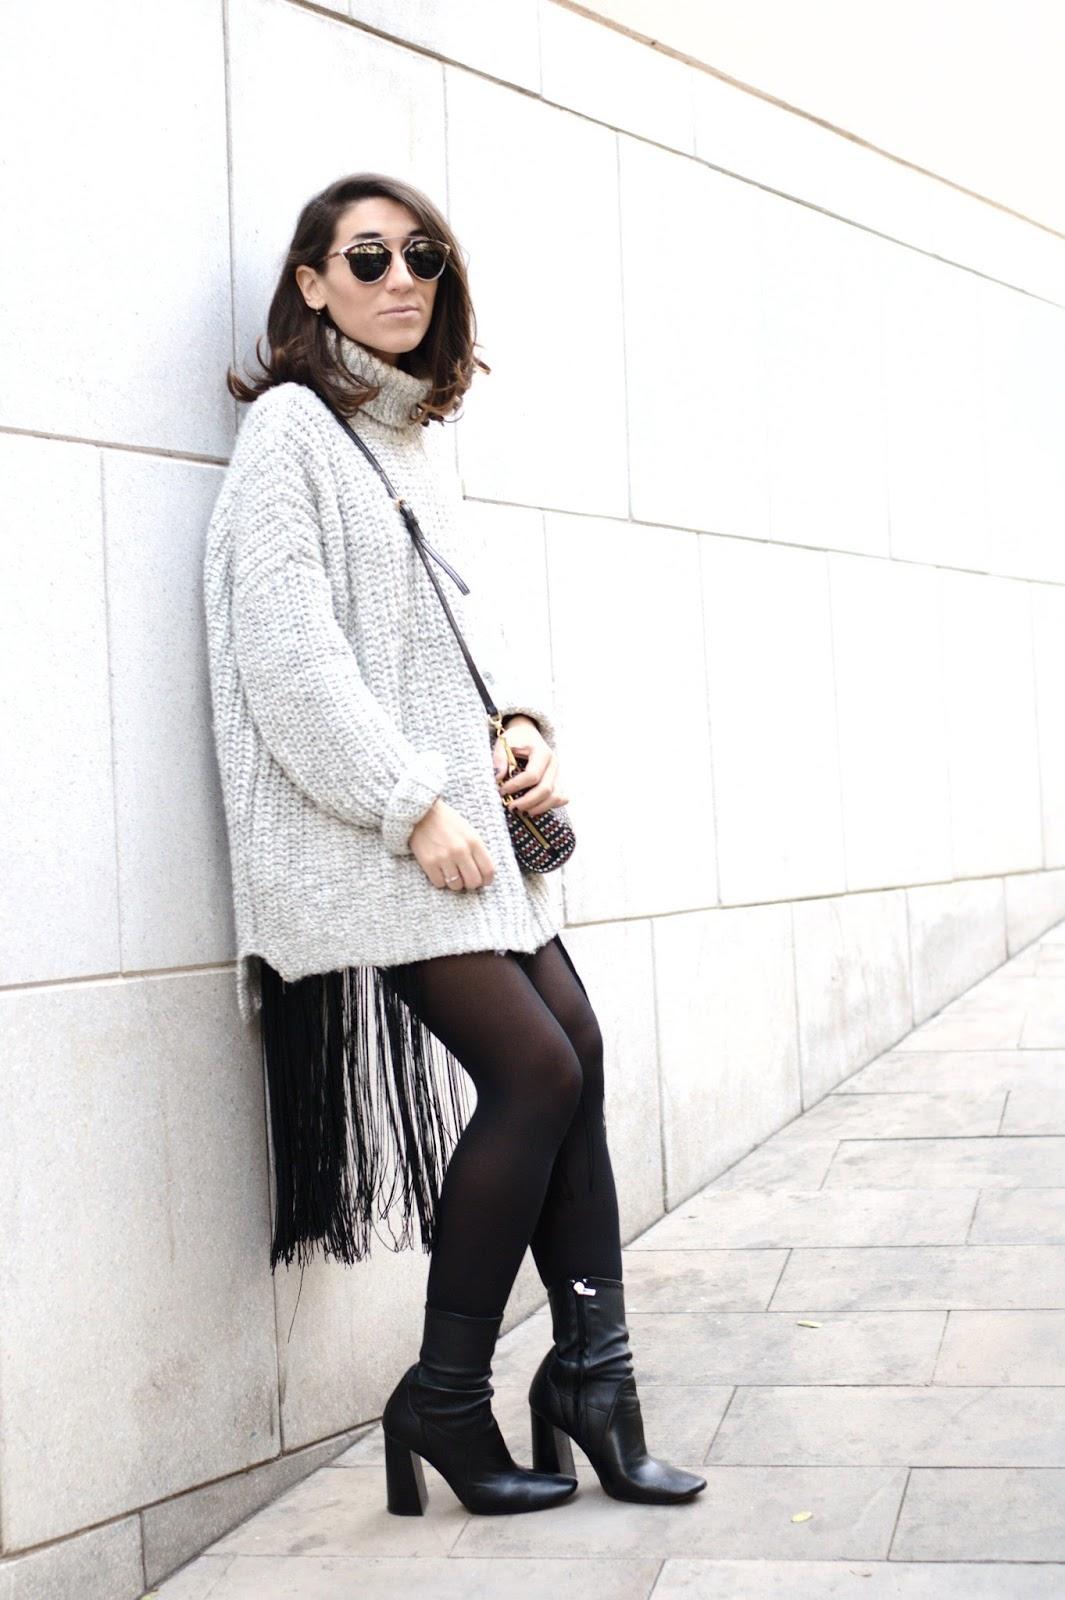 Falda H&M, Jersey y botines Zara, bolso Bimba y Lola